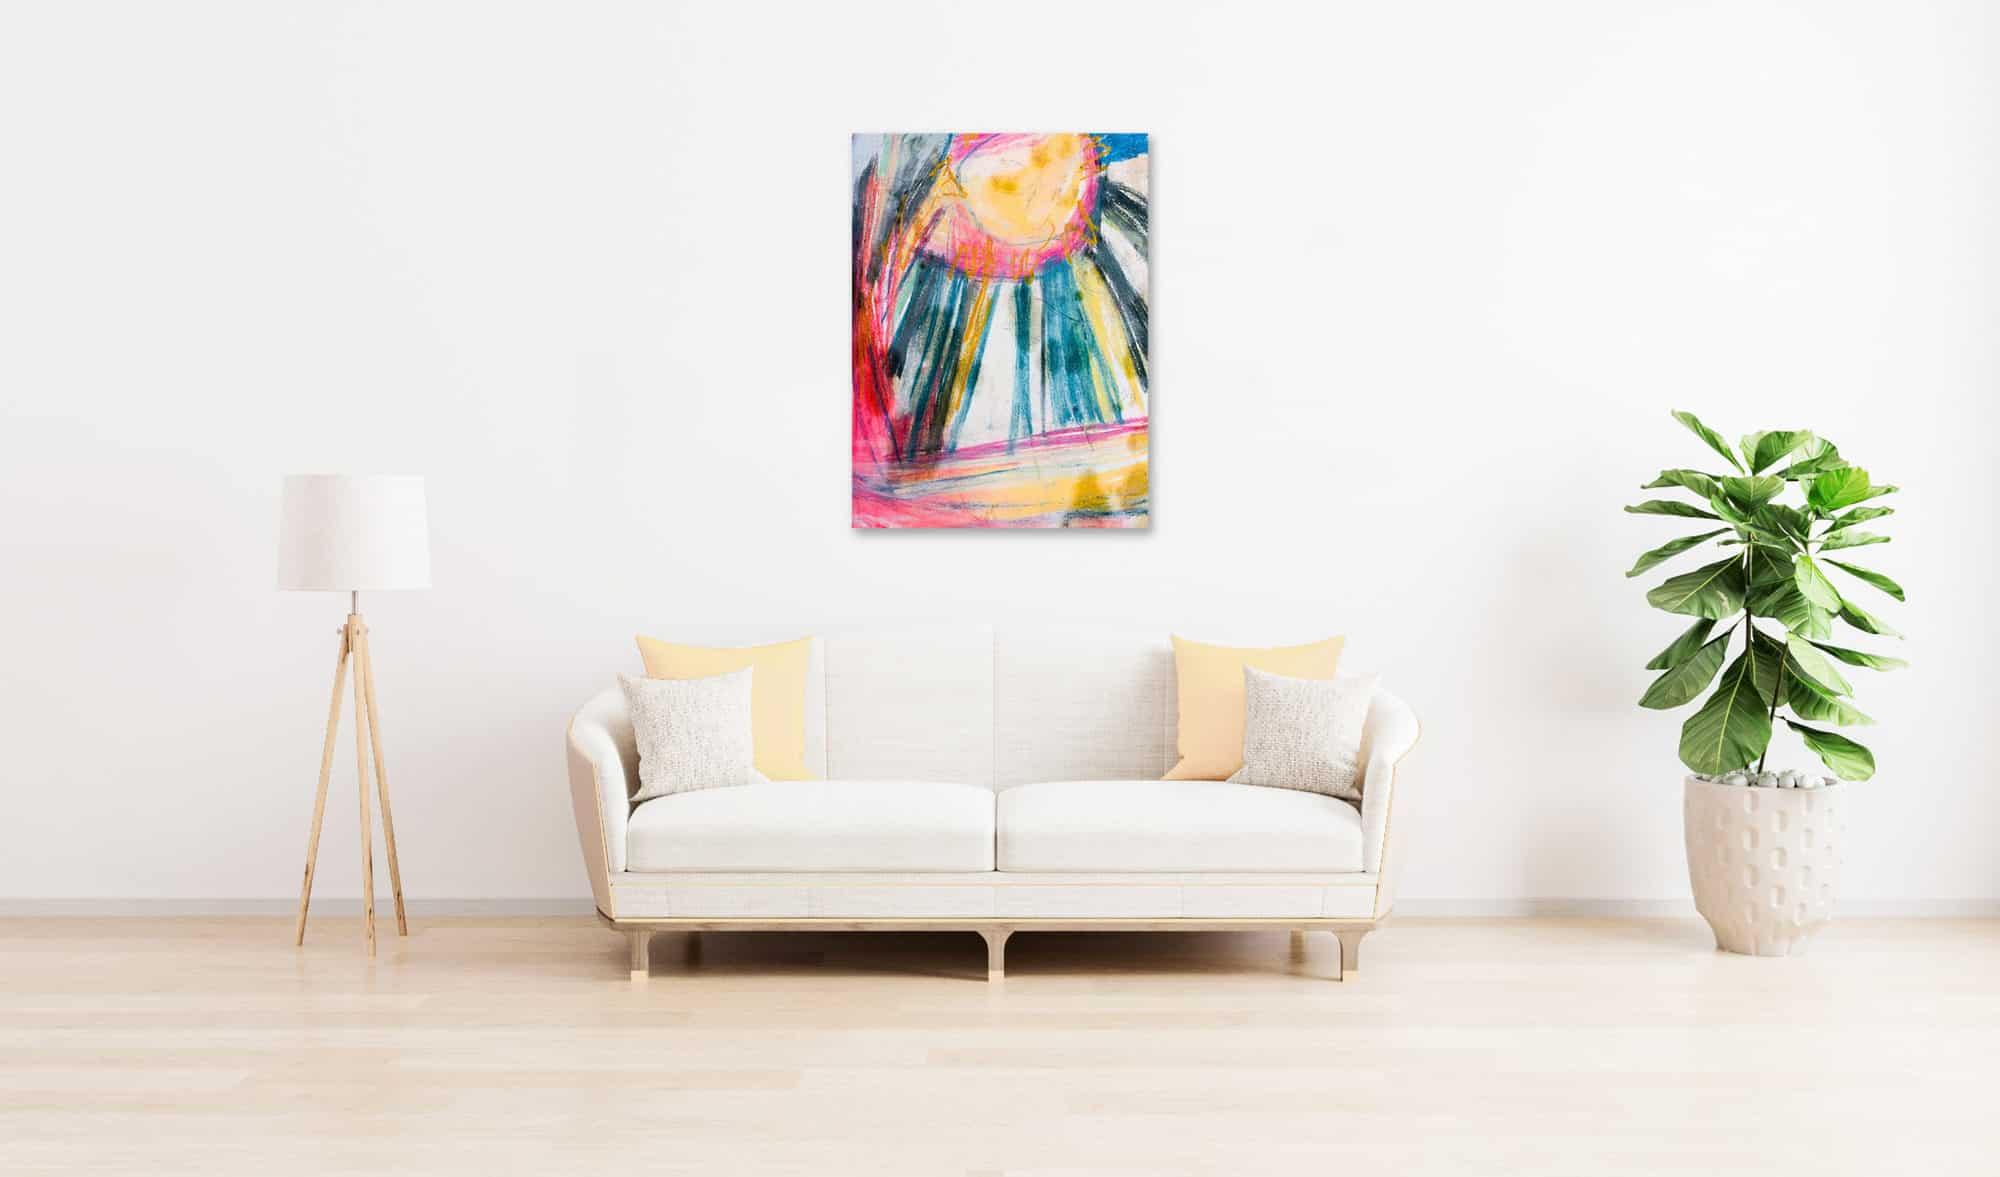 Abstraktes Acrylbild zarte Sonne mit Strahlen wandbild